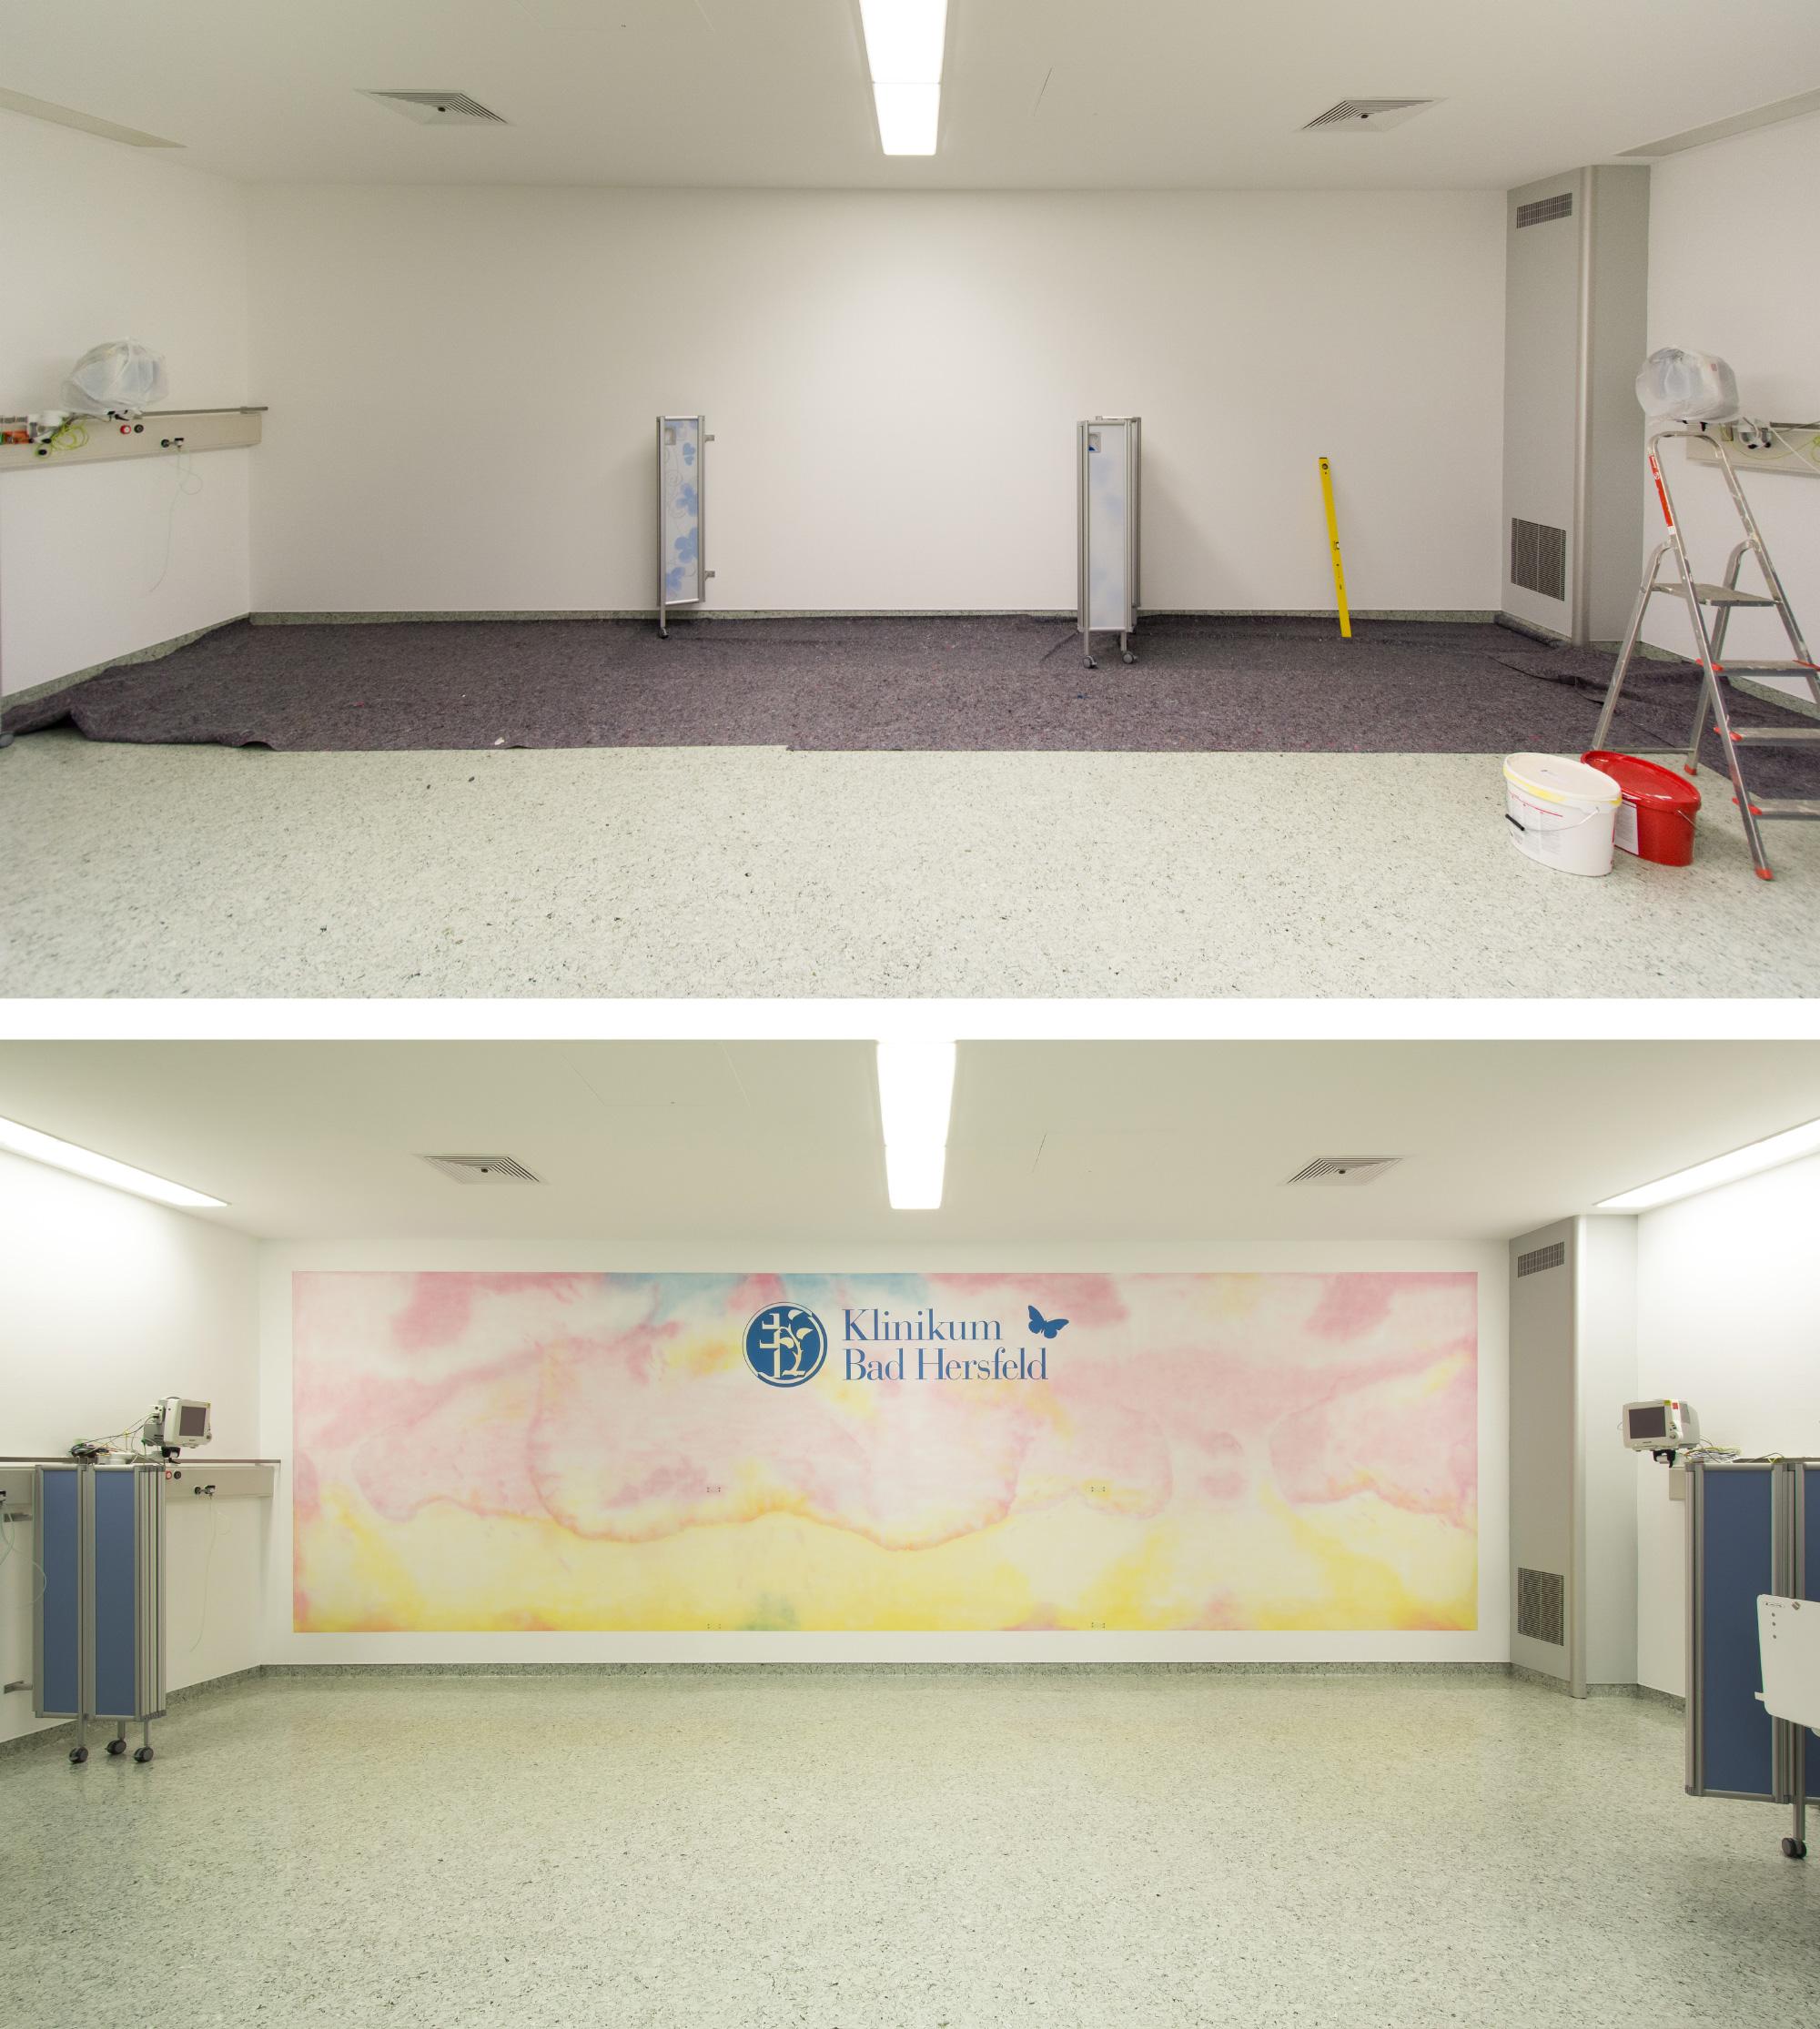 Aufwachraum Klinikum Bad Hersfeld Graffiti-Maler Sven Schmidt